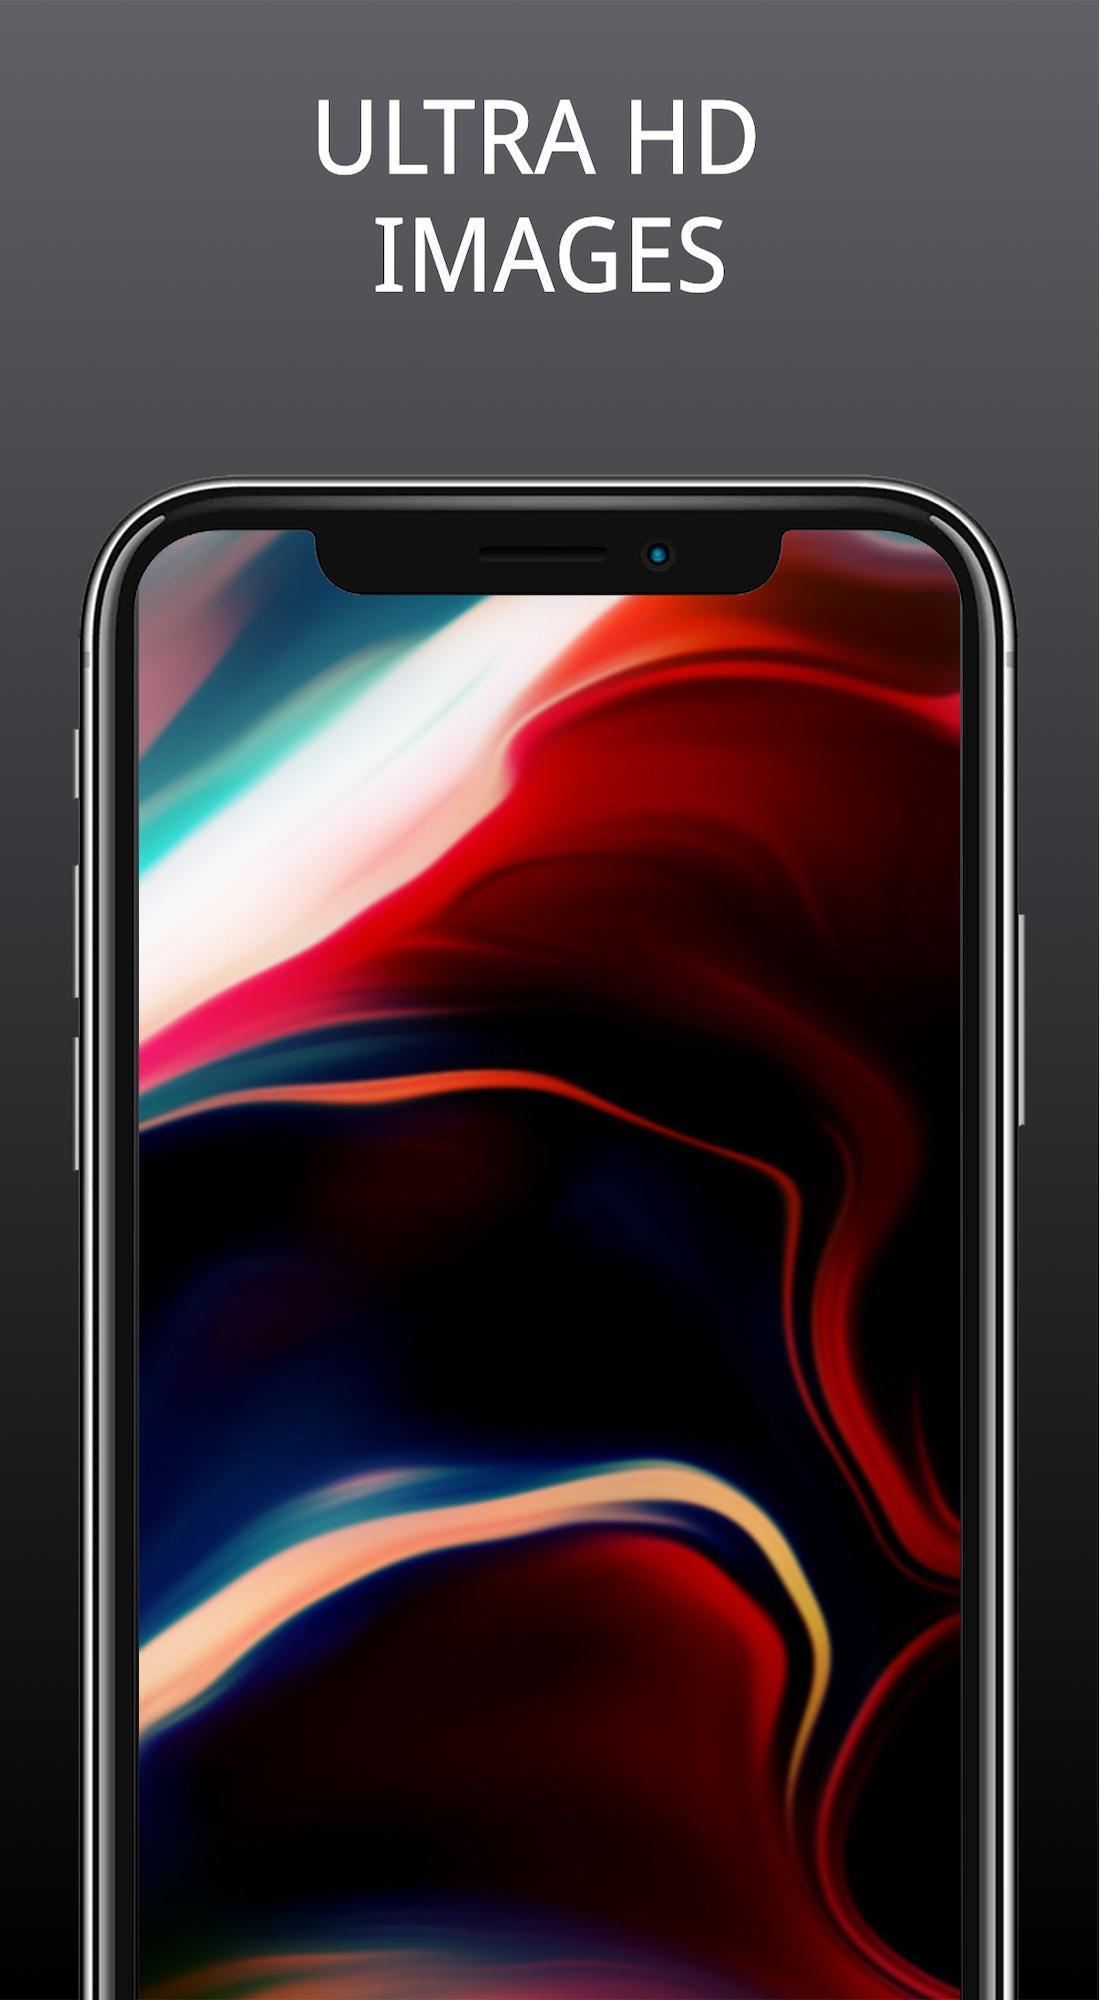 Iphone 11 Wallpaper Iphone 11 Wallpaper Ultra Hd